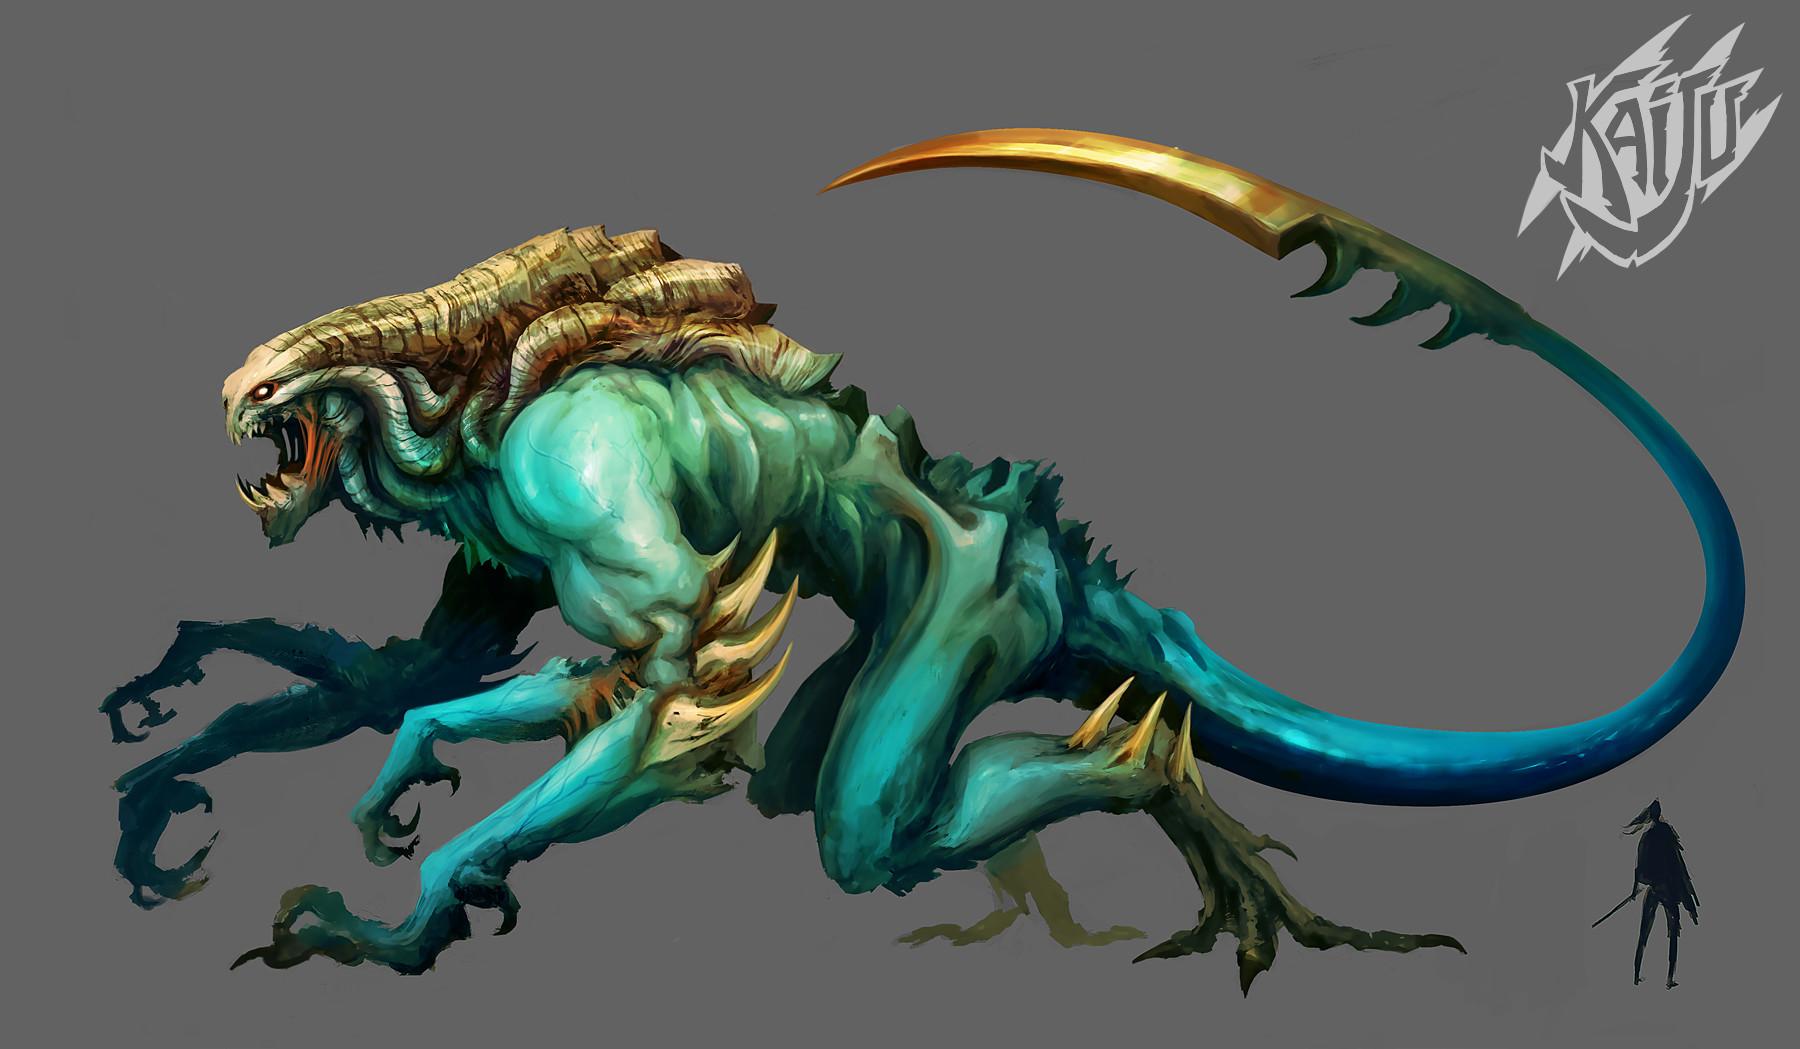 Alexandre chaudret kaijus creature predator08b